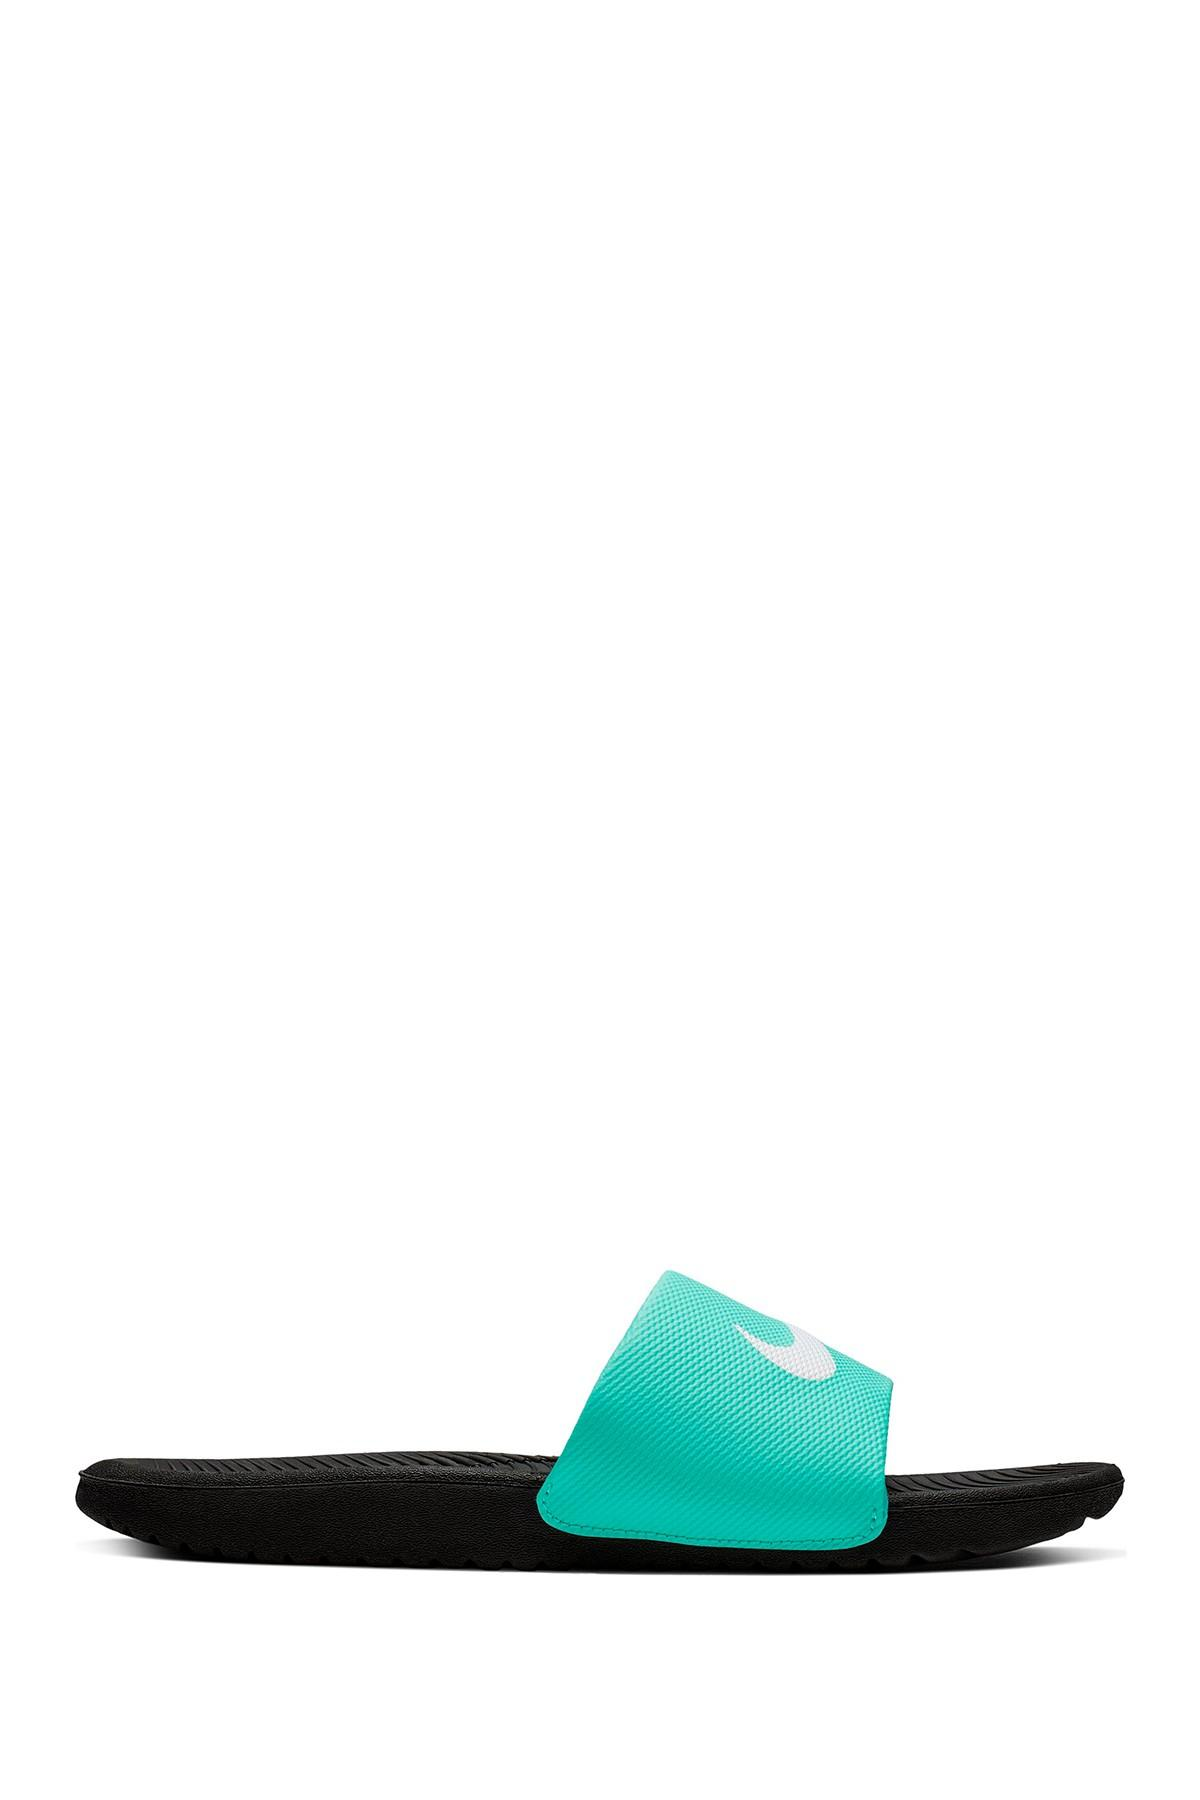 Nike Kawa Signature Slide Sandal in